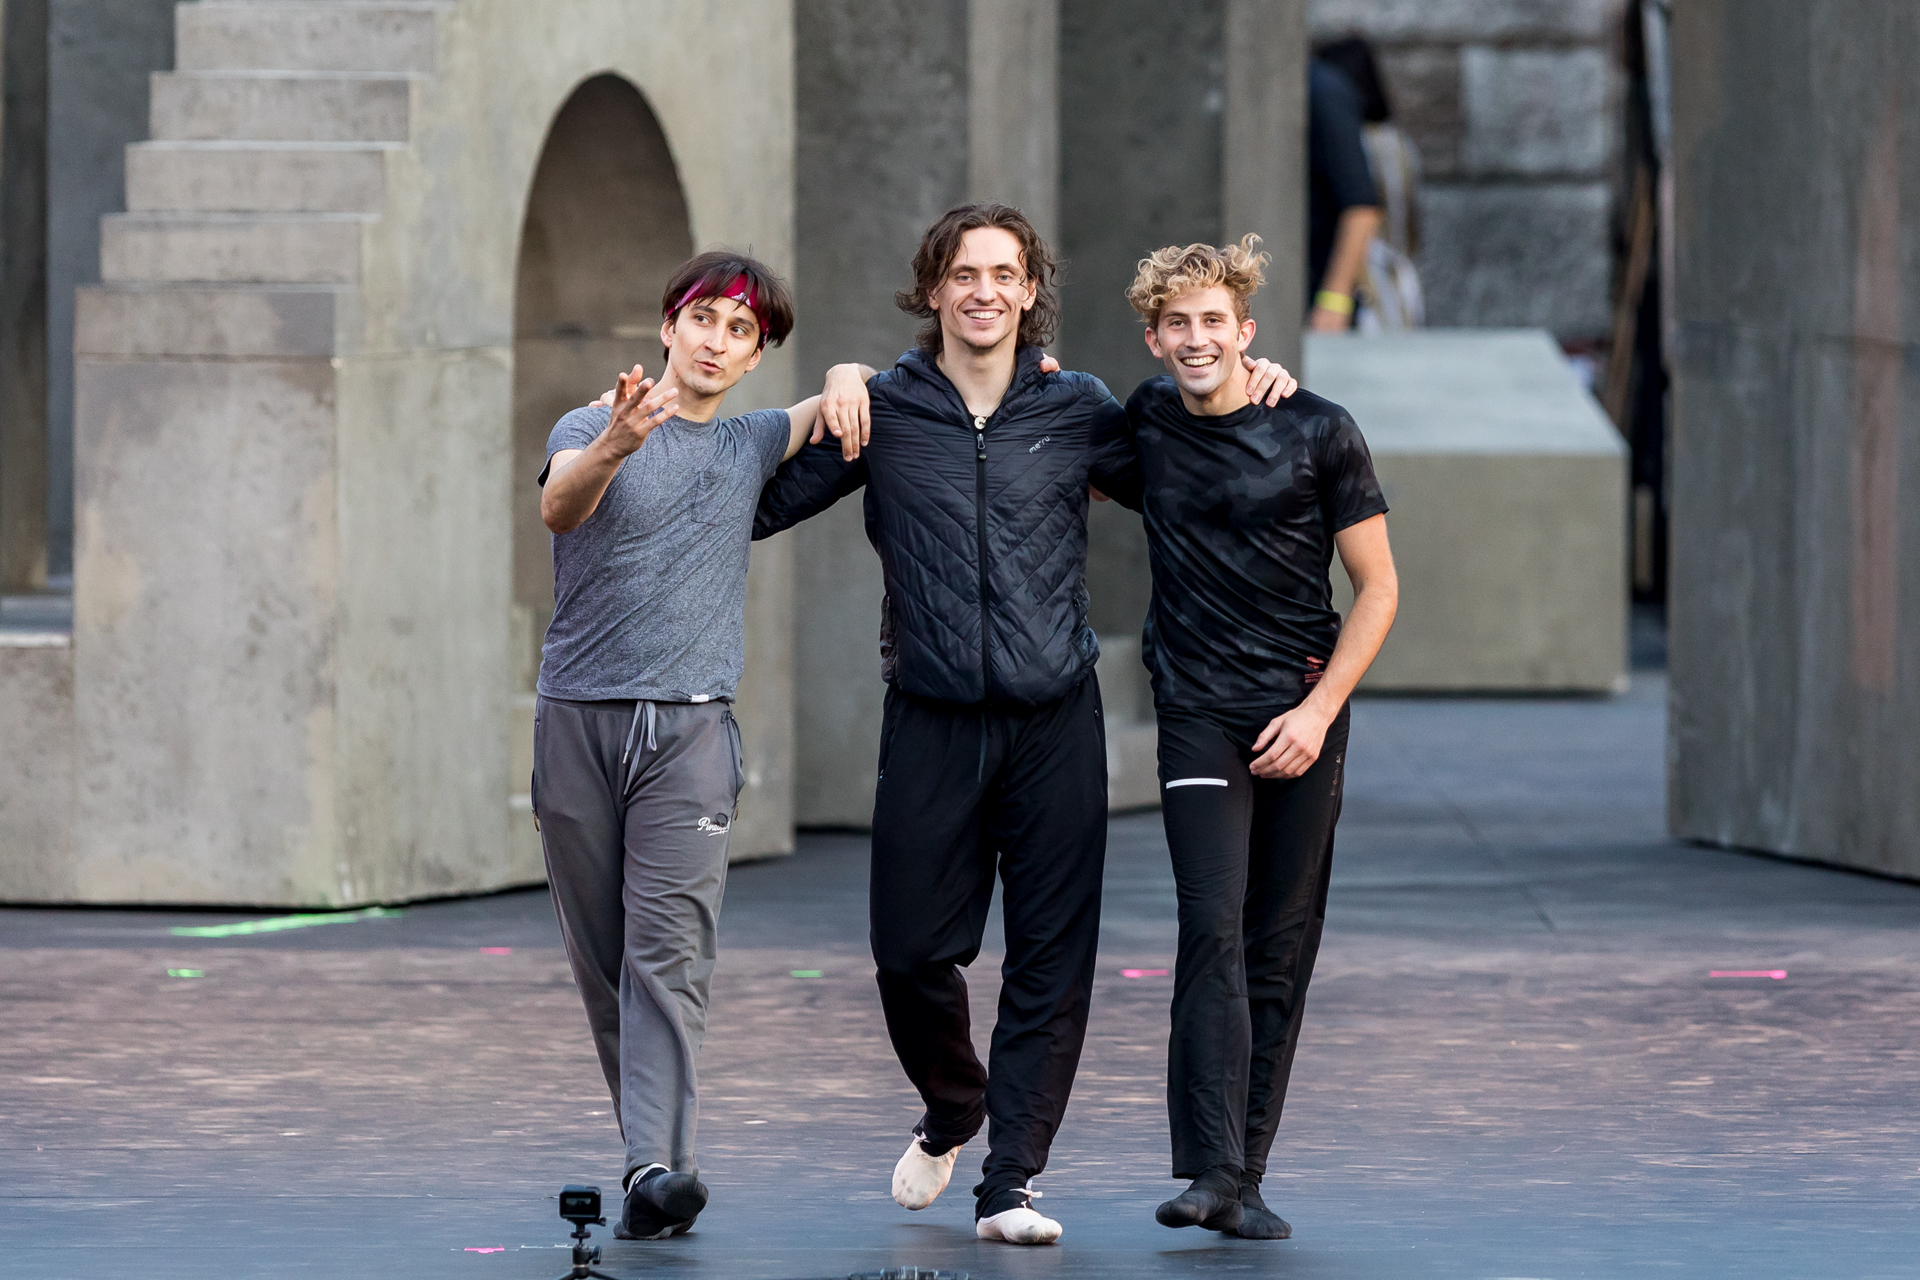 2019_08_26-Romeo-and-Juliet-©-Luca-Vantusso-191715-5D4B0115